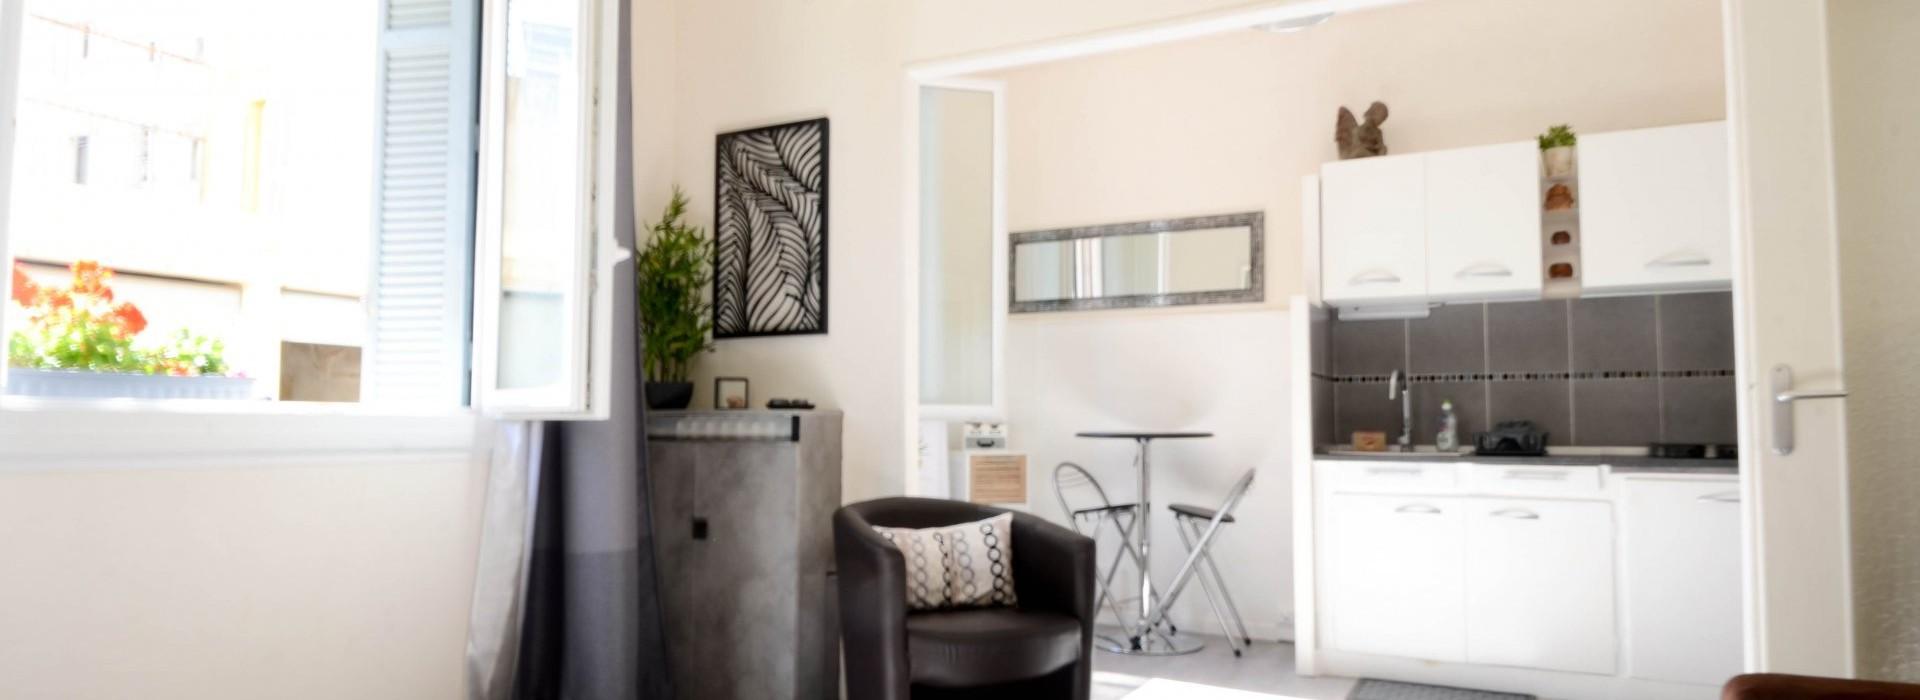 Appartement Nice 1 Pièce 33m2 132,000€